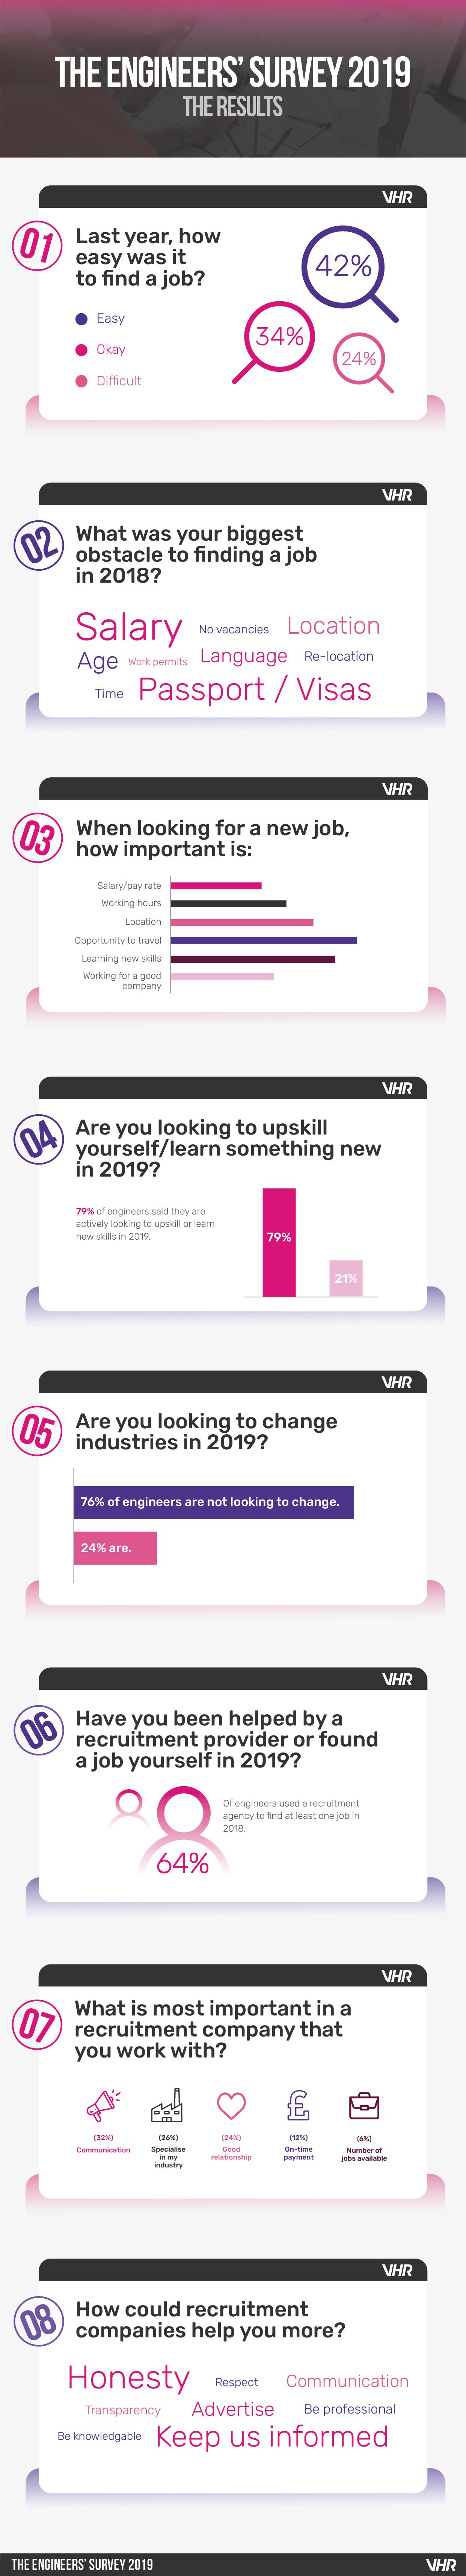 Engineers Survey 2019 Infographic